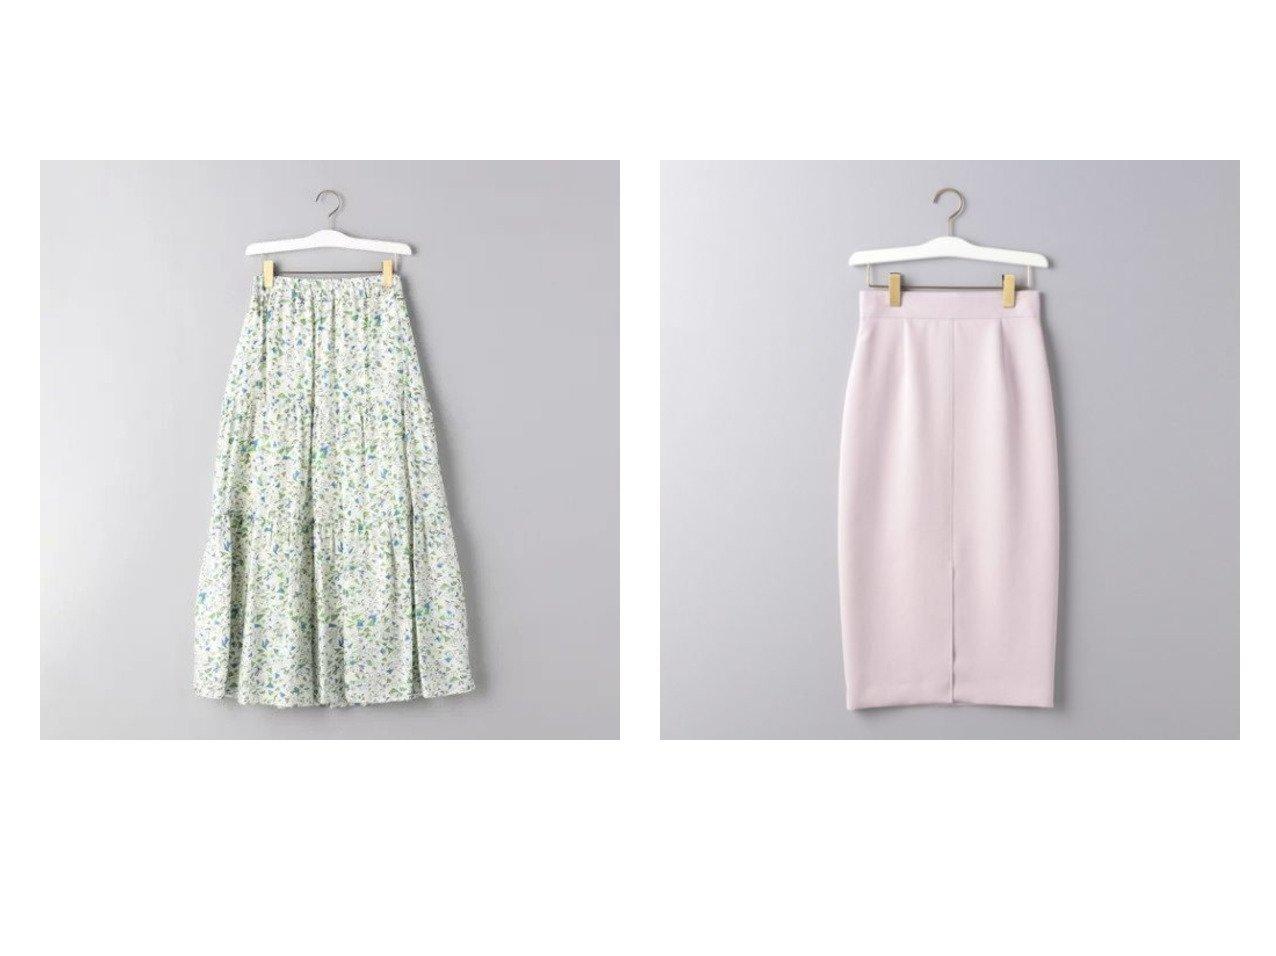 【UNITED ARROWS/ユナイテッドアローズ】のUBCB サテン フロントベントスカート&プリント ティアード マキシスカート スカートのおすすめ!人気、トレンド・レディースファッションの通販 おすすめで人気の流行・トレンド、ファッションの通販商品 メンズファッション・キッズファッション・インテリア・家具・レディースファッション・服の通販 founy(ファニー) https://founy.com/ ファッション Fashion レディースファッション WOMEN スカート Skirt ティアード ティアードスカート ノースリーブ プリント マキシ リラックス ロング サテン タイトスカート |ID:crp329100000023881